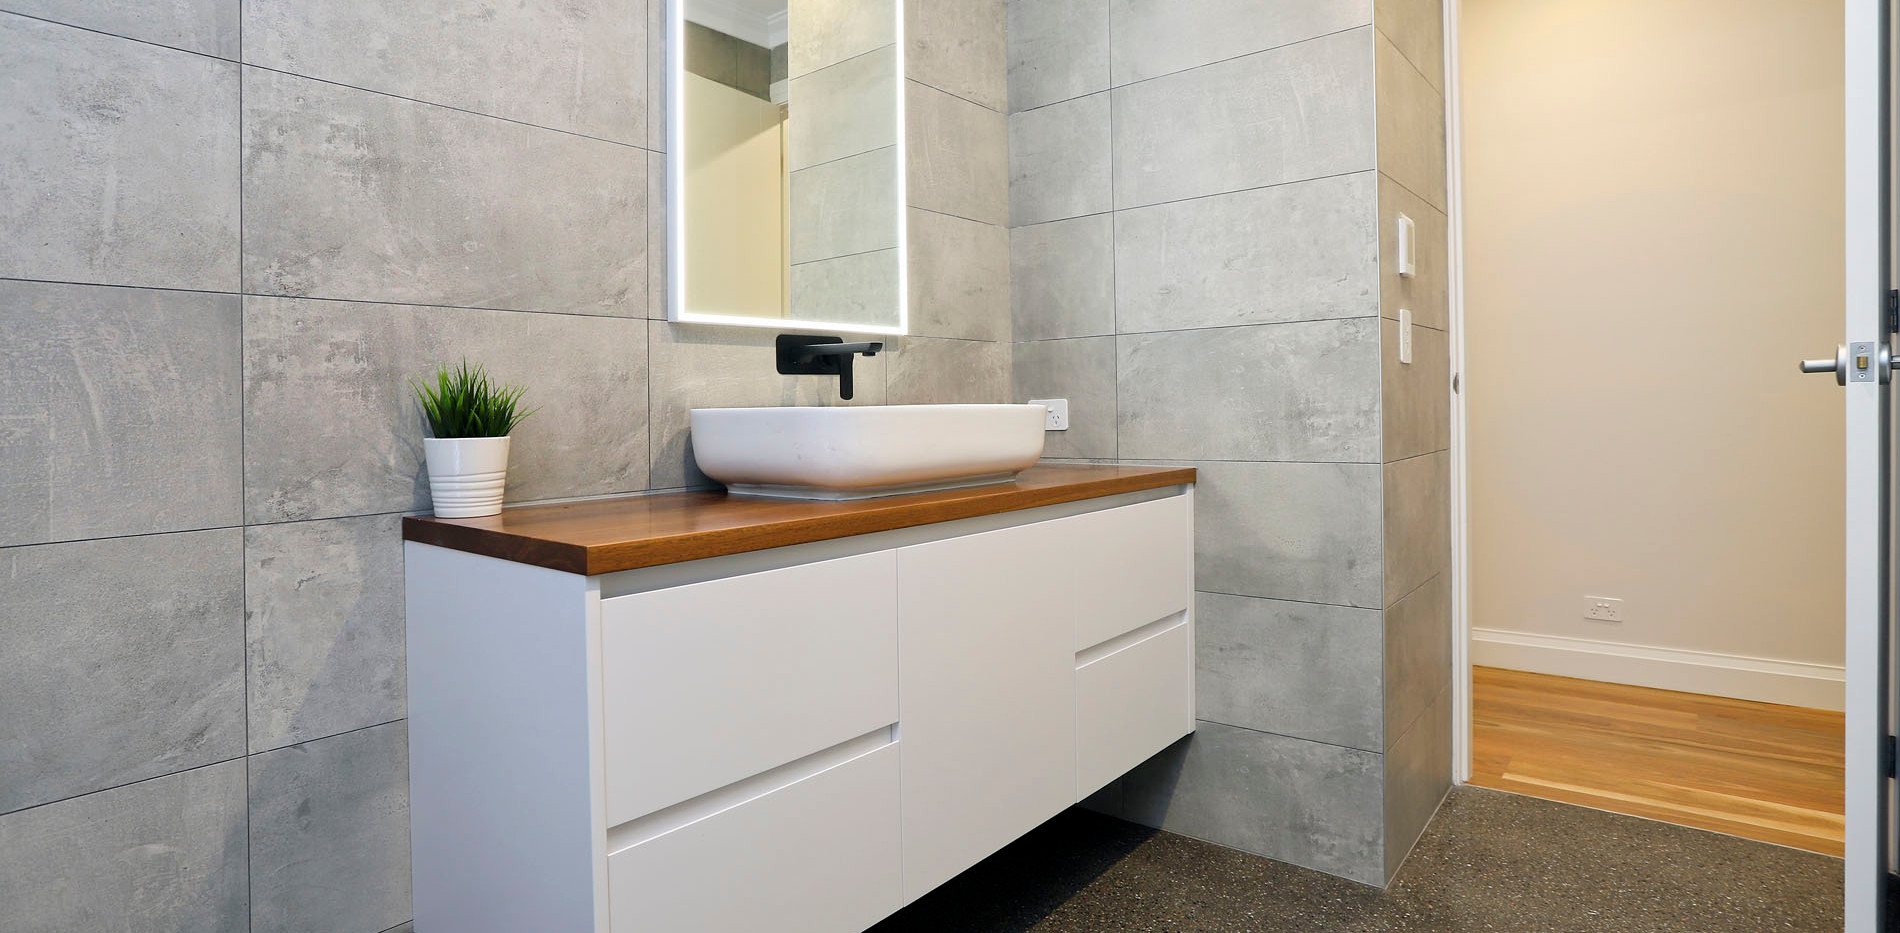 Small Bathrooms-Powder Rooms (15)